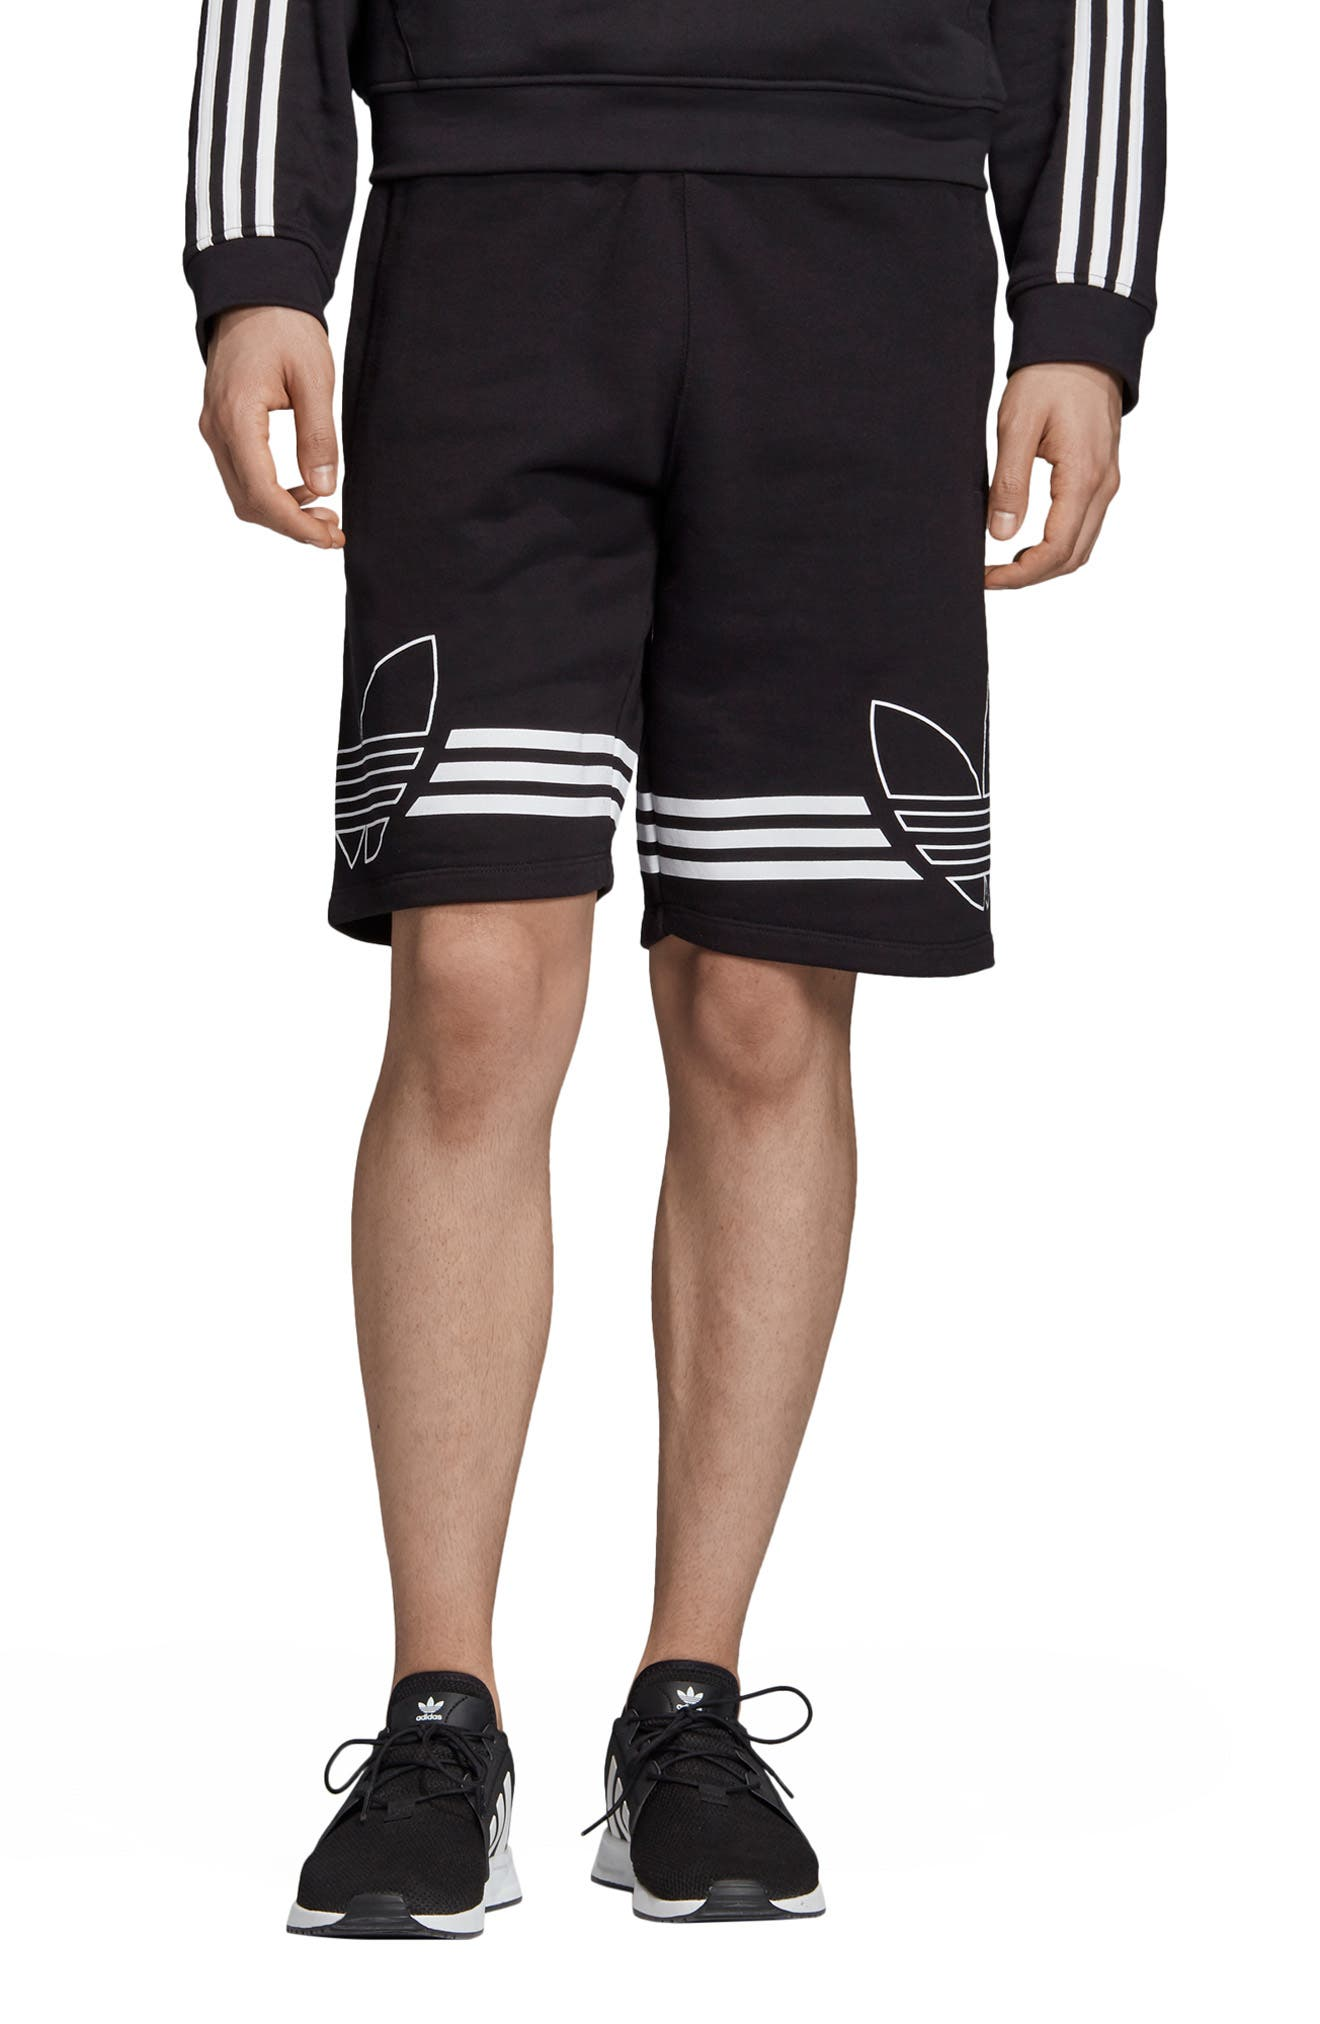 Adidas Originals Shorts Outline Trefoil Athletic Shorts